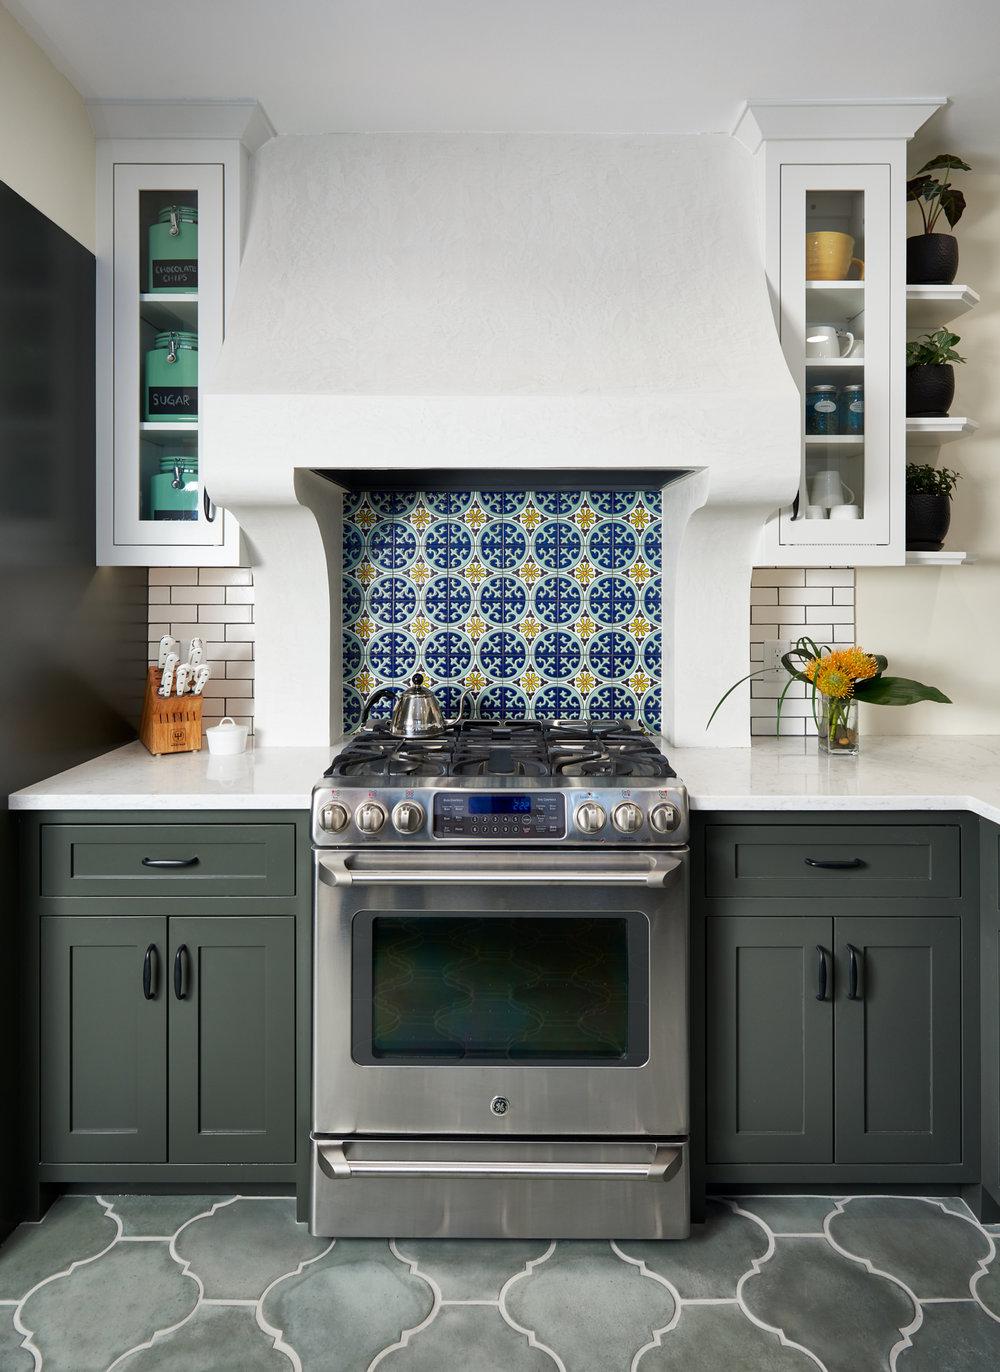 Custom tile in kitchen designed by NewStudio Architecture